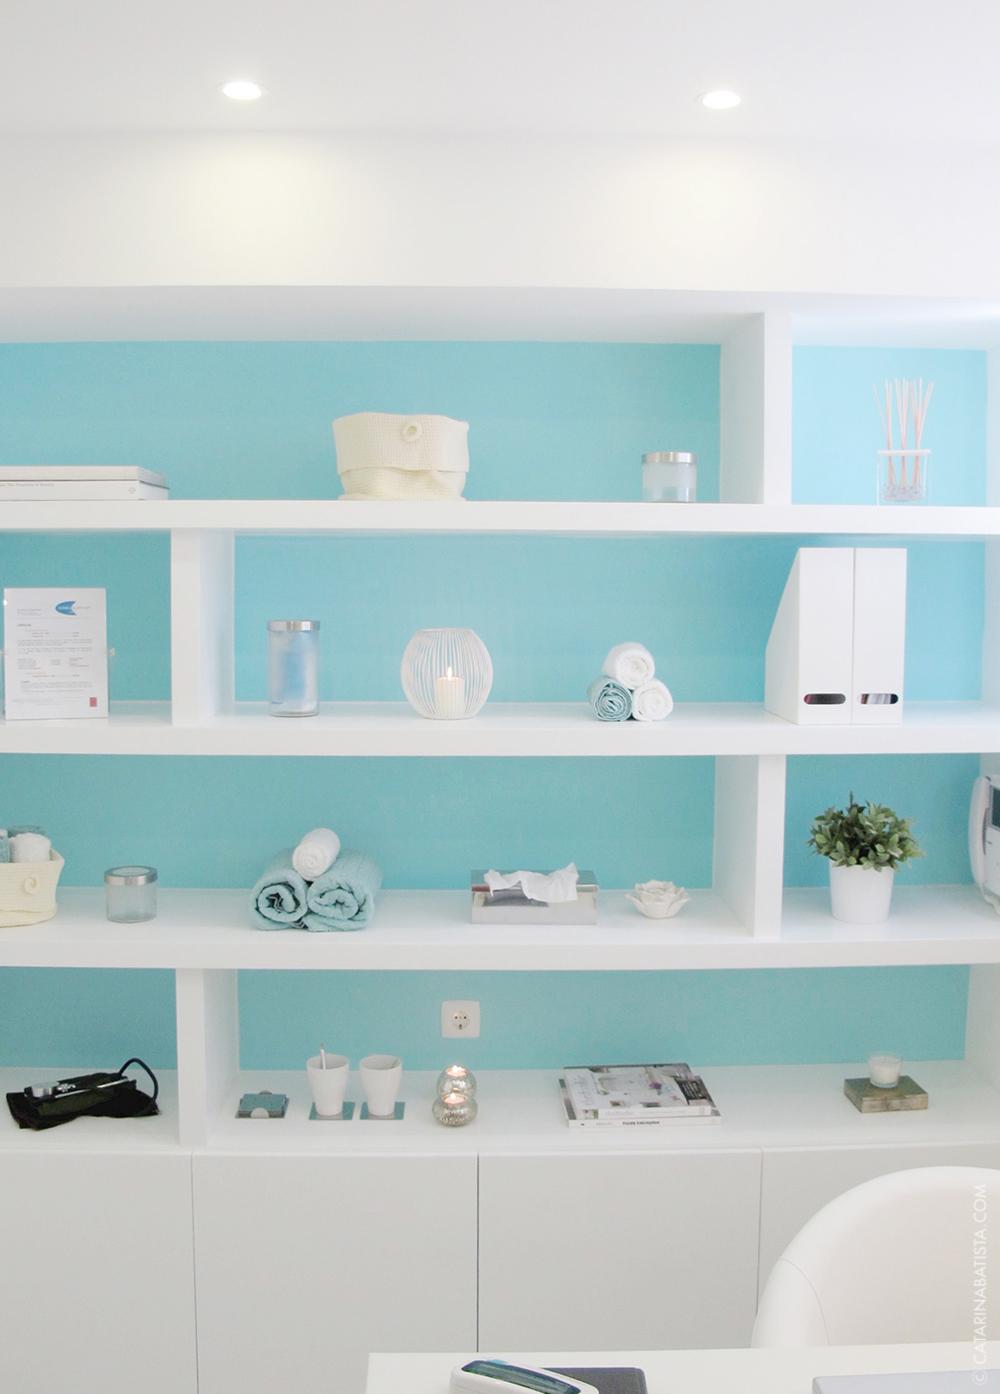 003-catarina-batista-arquitectura-design-interior-decoracao-clinicia.jpeg